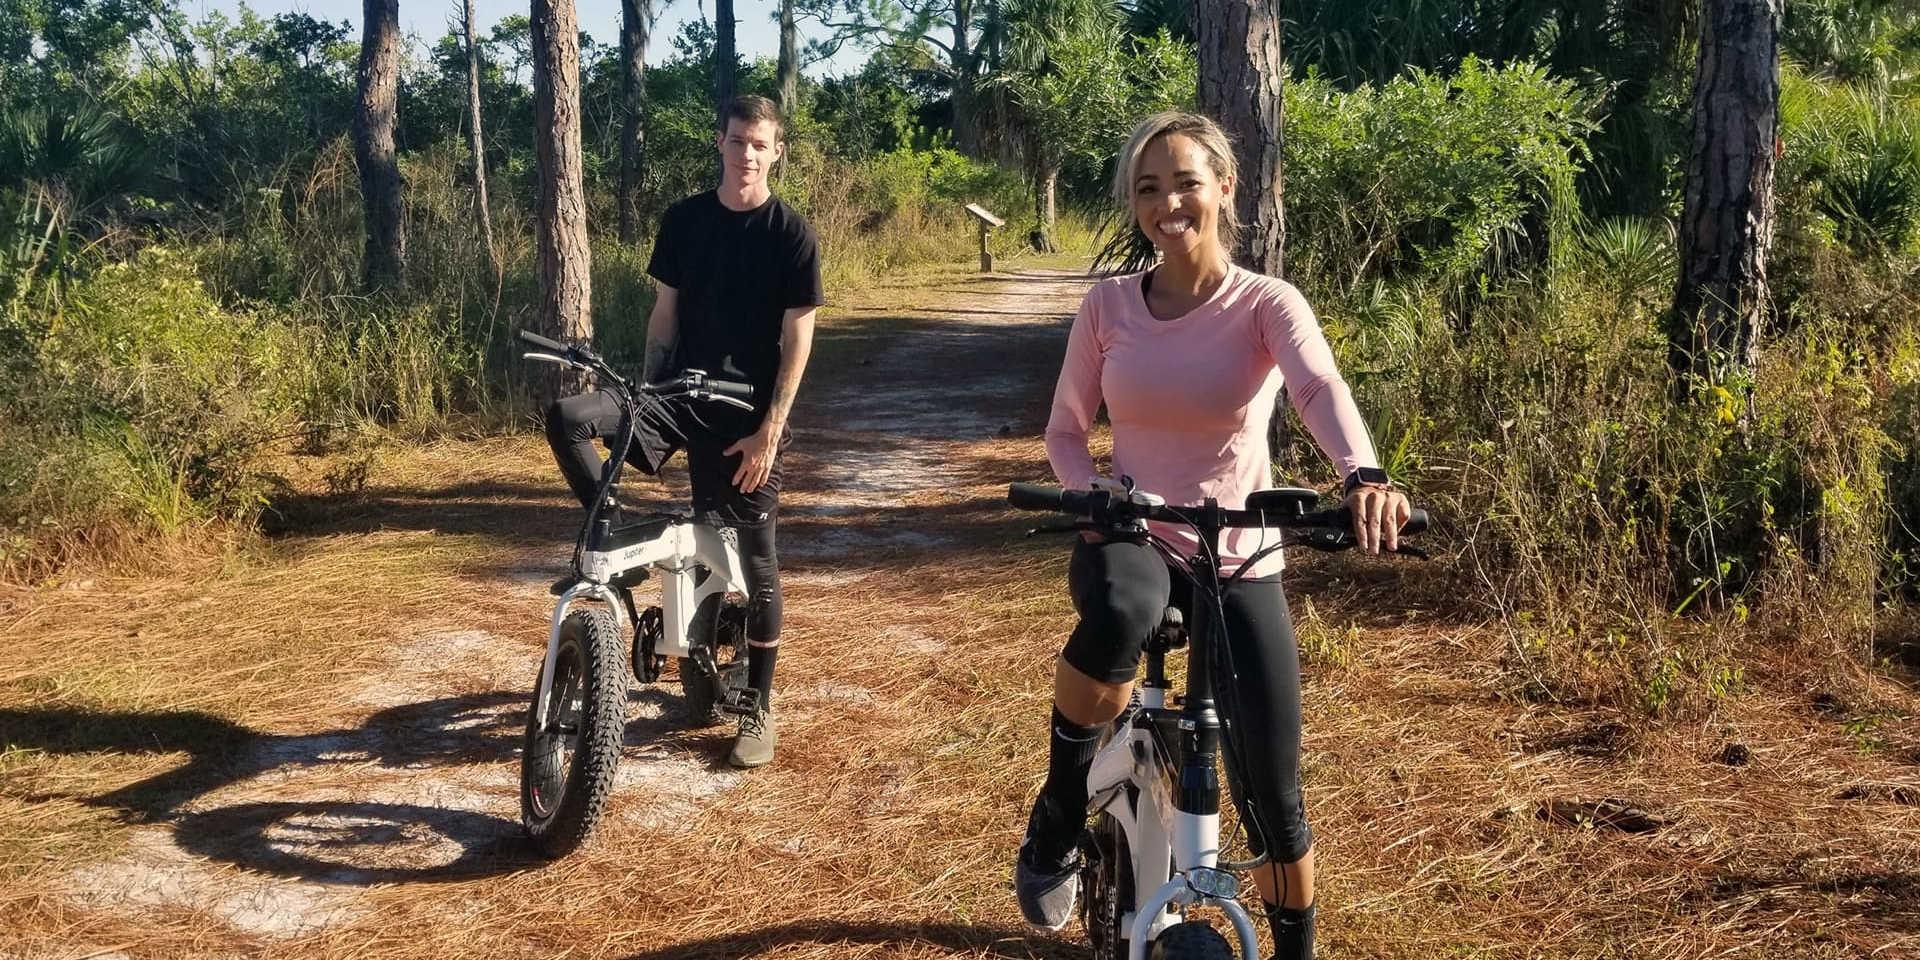 Jupiter Bike Defiant Folding Fat Tire Ebike trail riding